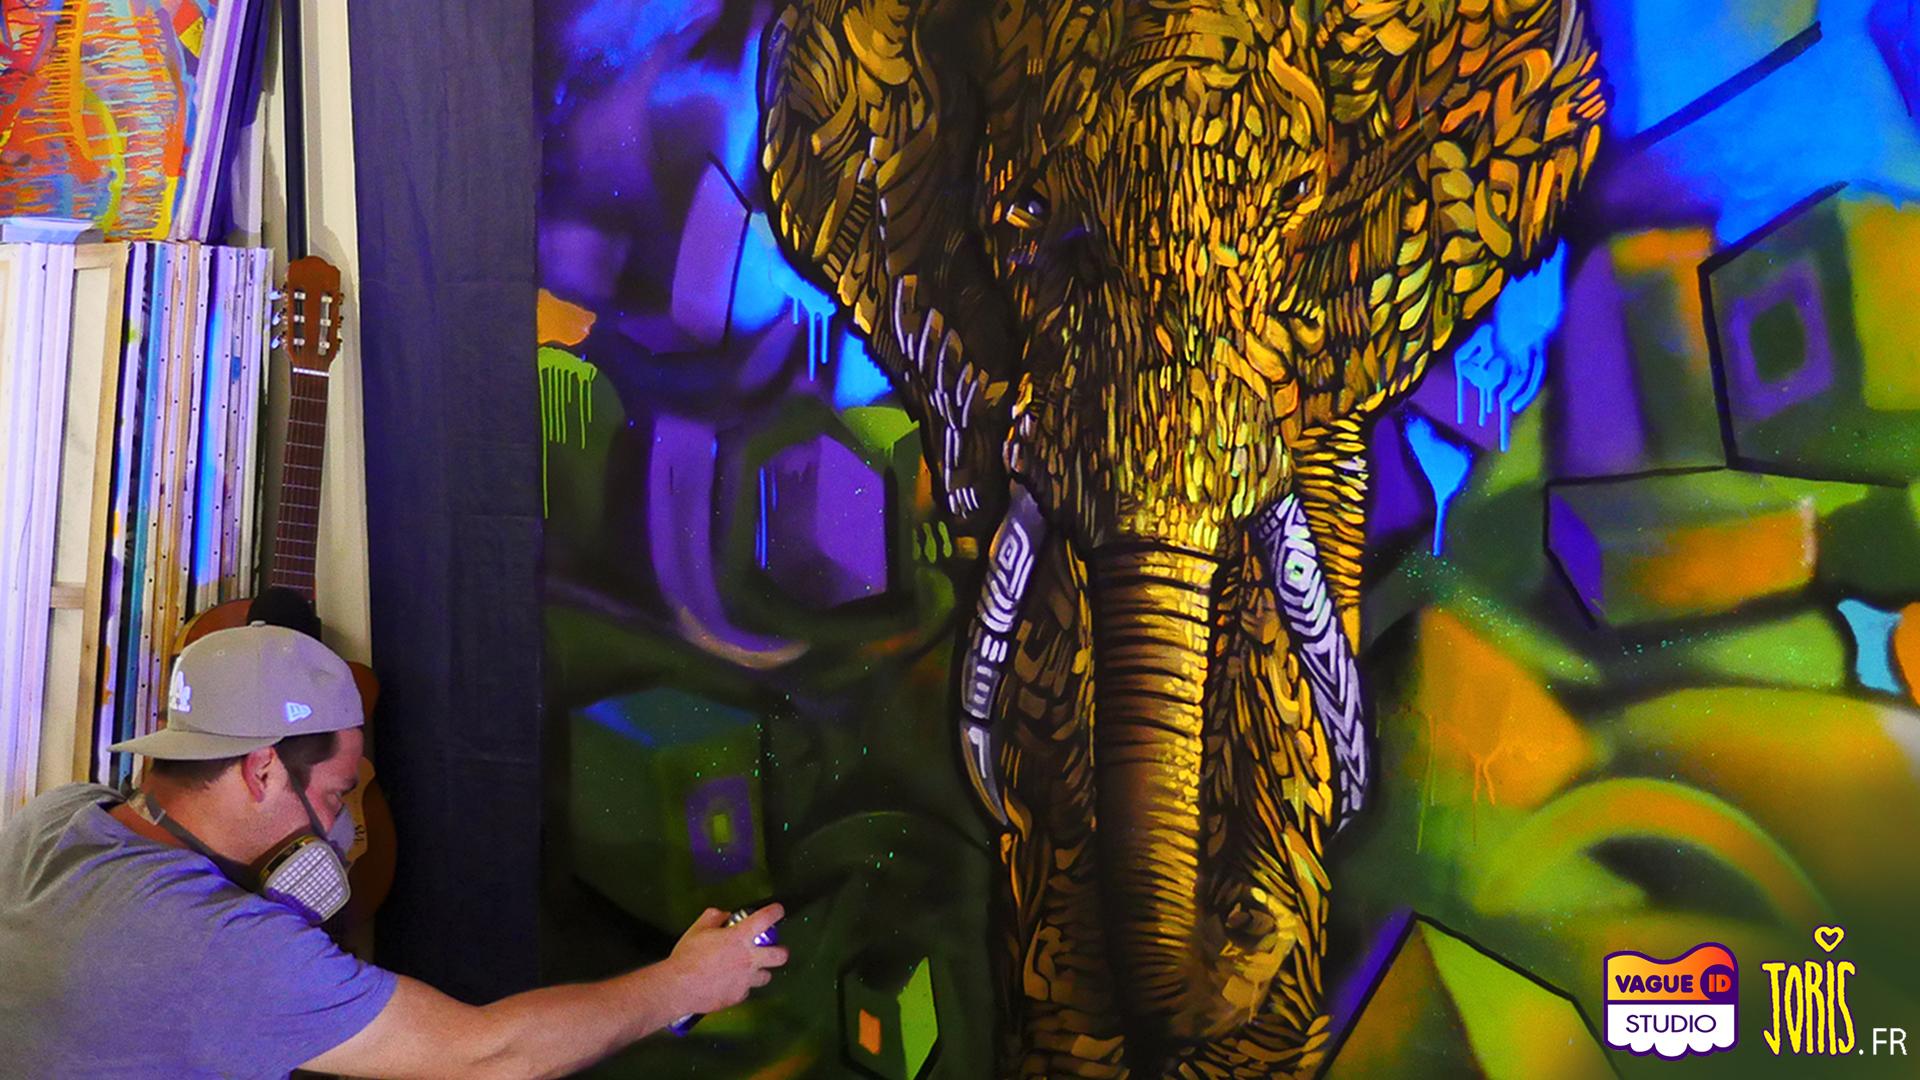 DECORATION-GRAFFITI-FRESQUE-TABLEAU-STREET-ART-PARIS-16